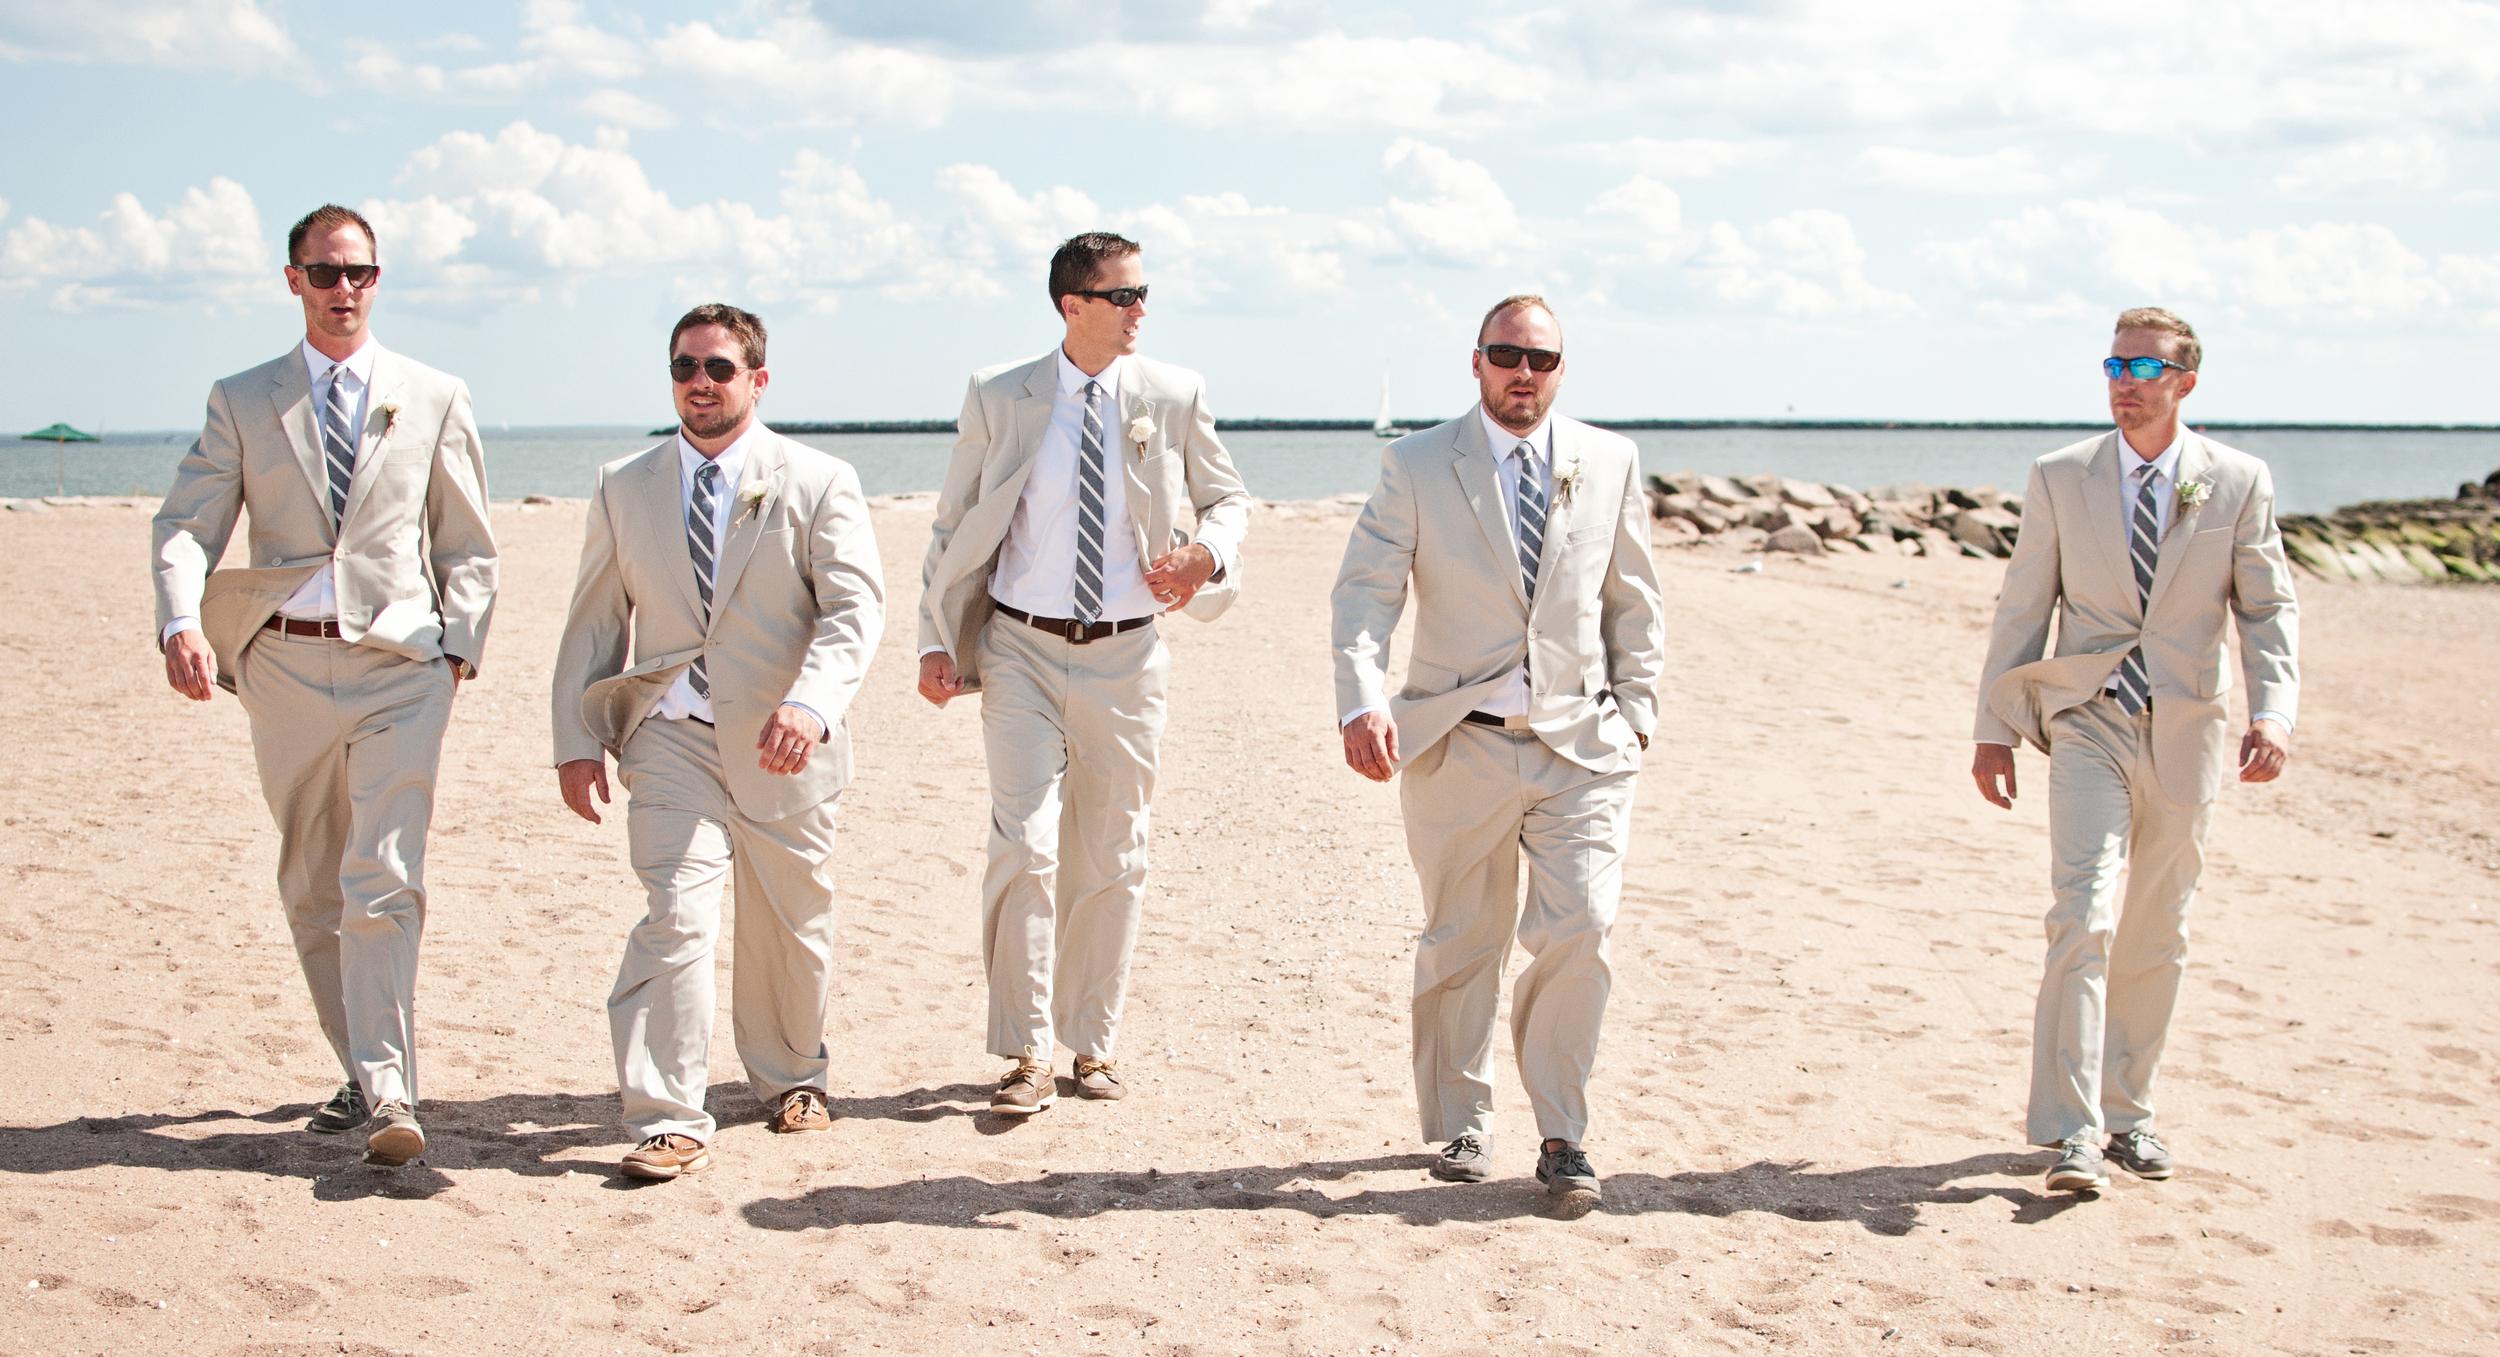 Angela_Chicoski_CT_wedding_photographer_065.jpg